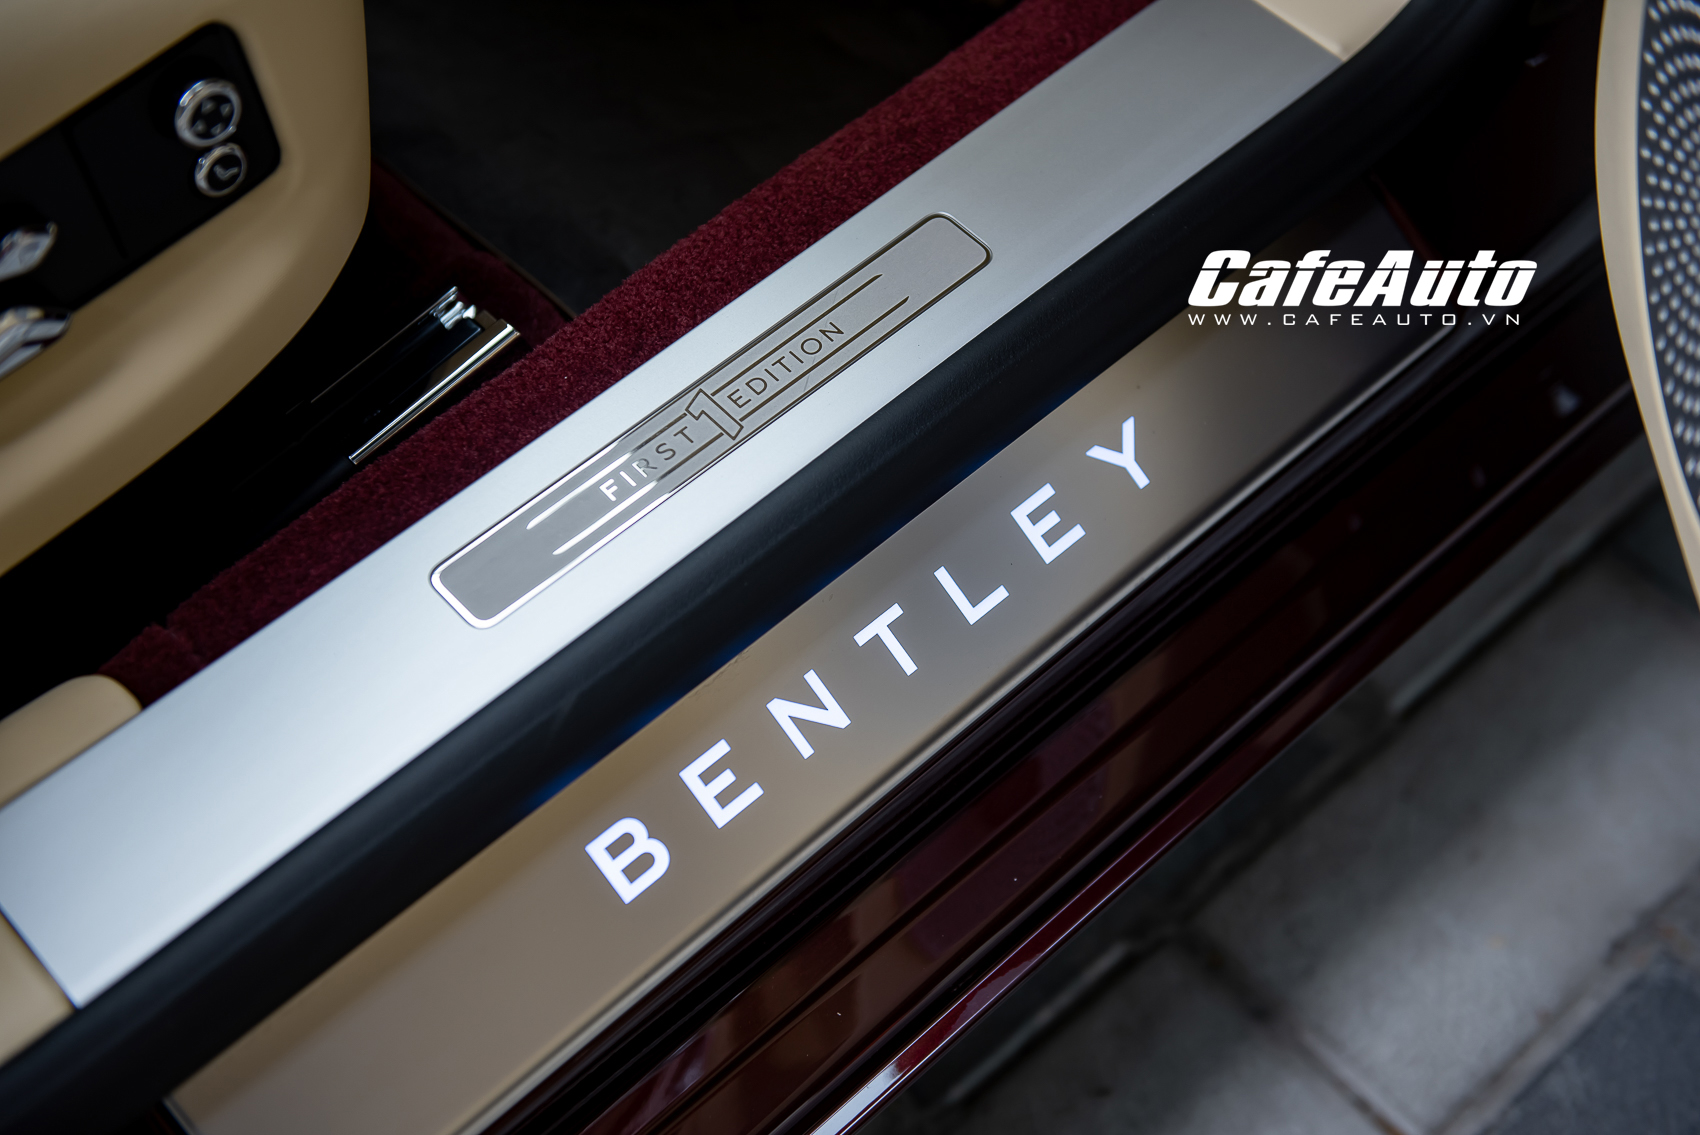 bentleyflyingspur2021-cafeautovn-41